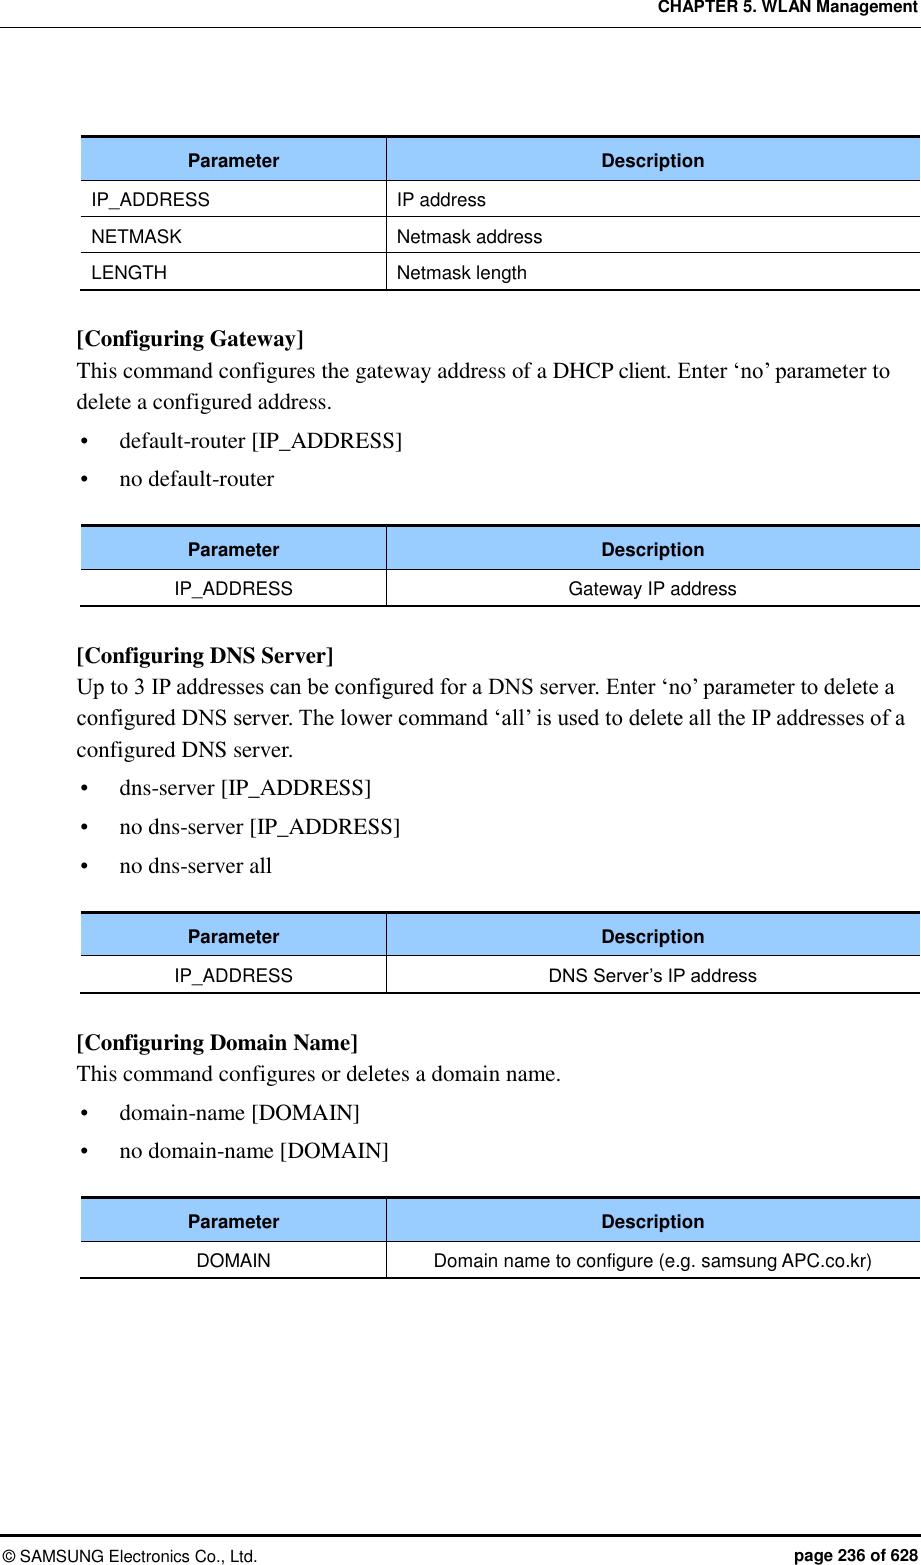 Samsung Electronics Co WEA453E WLAN Access Point User Manual